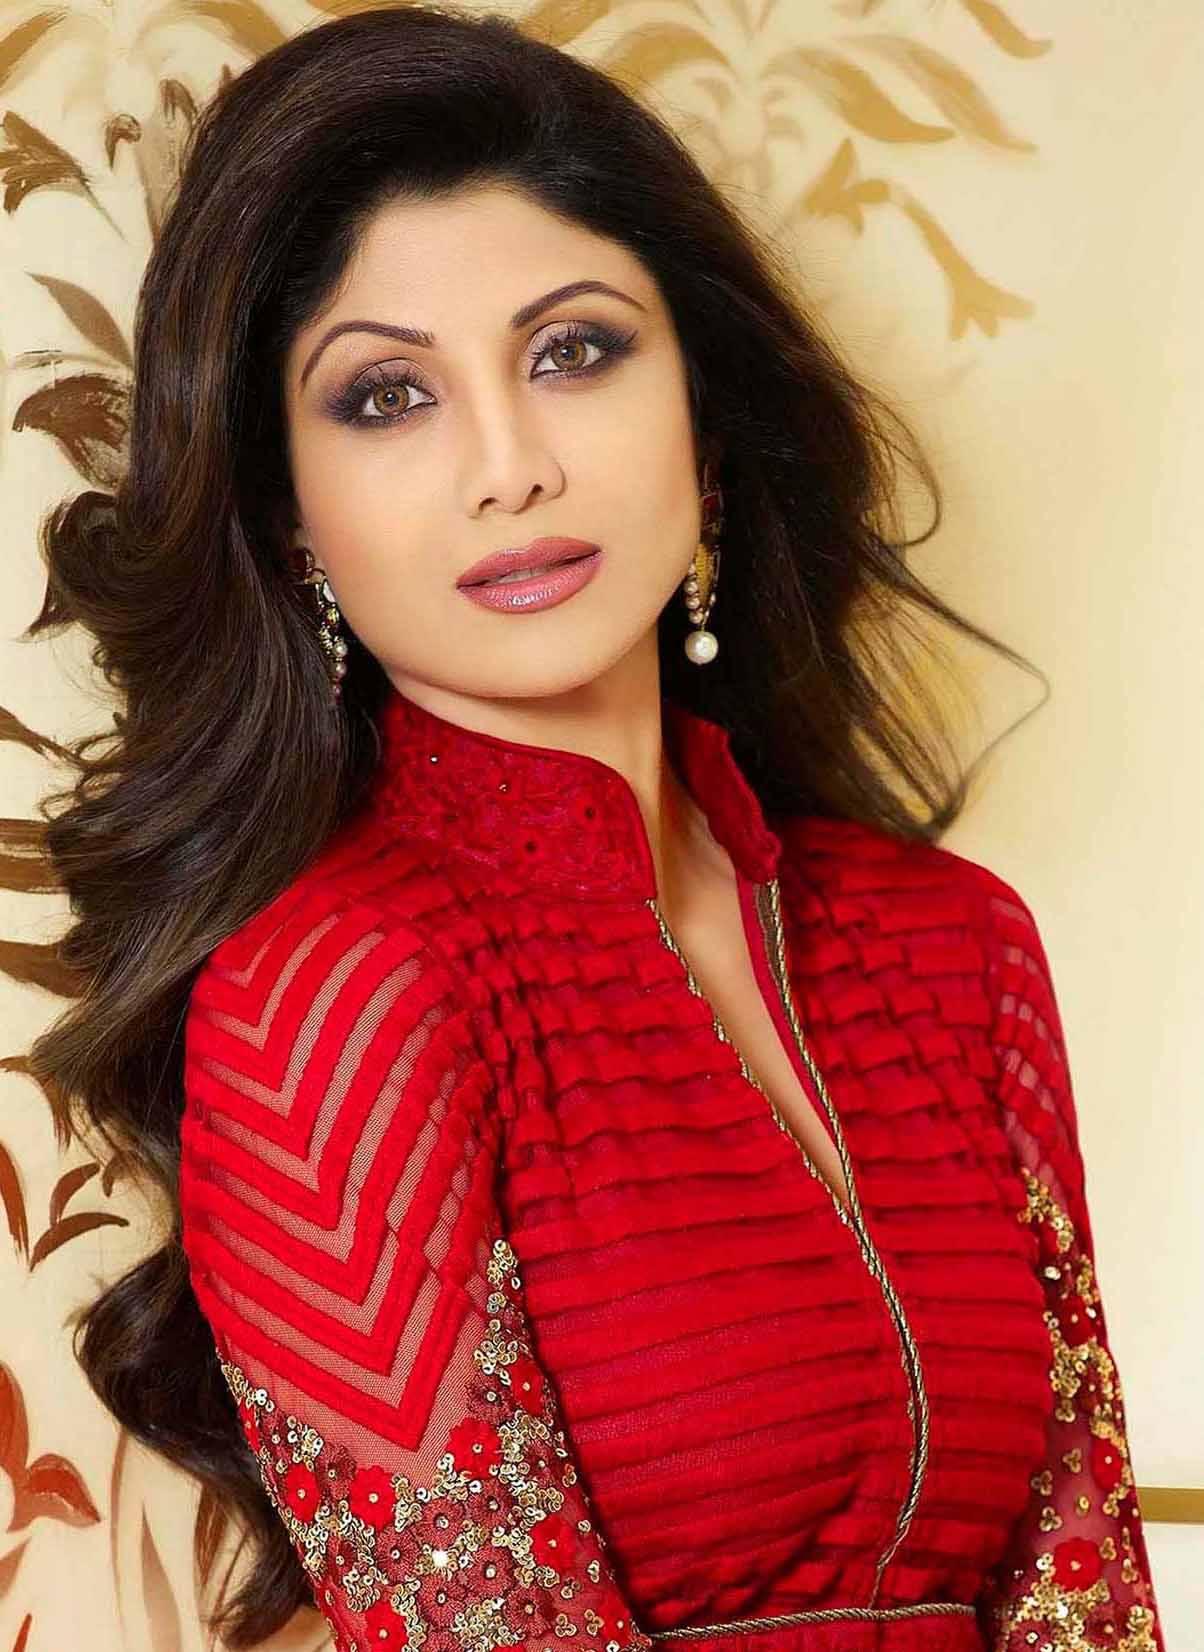 shilpa shetty Age, instagram, Husband, Height, wikipedia, image,Twitter, Yoga, Family, smile, hot